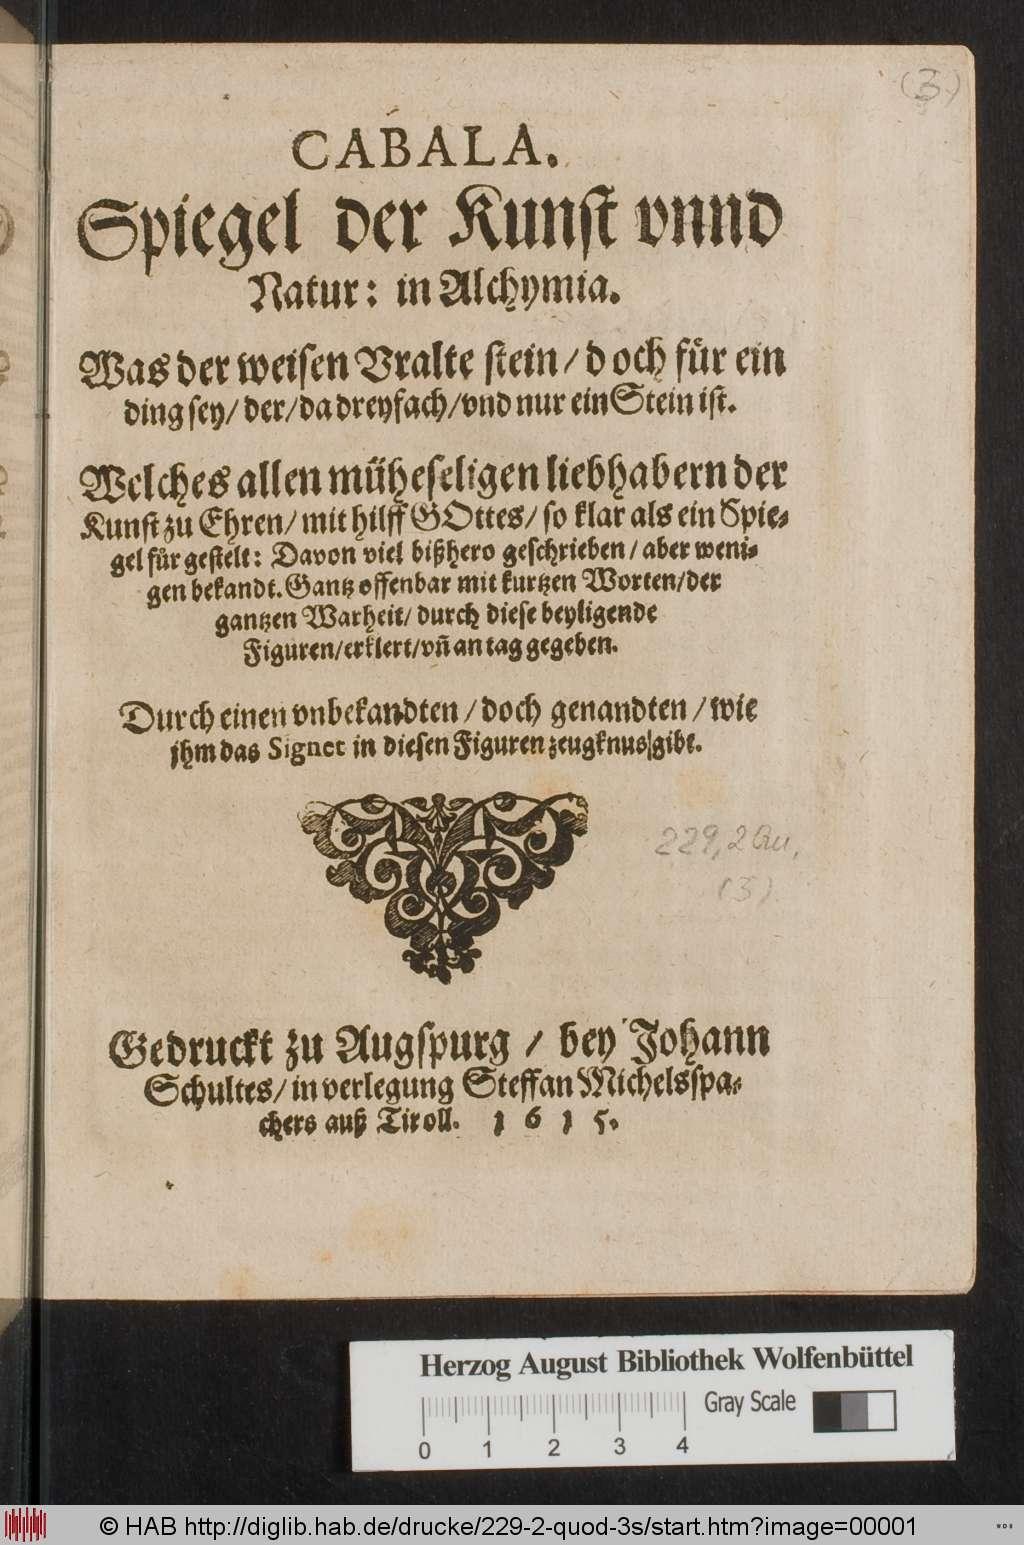 http://diglib.hab.de/drucke/229-2-quod-3s/00001.jpg